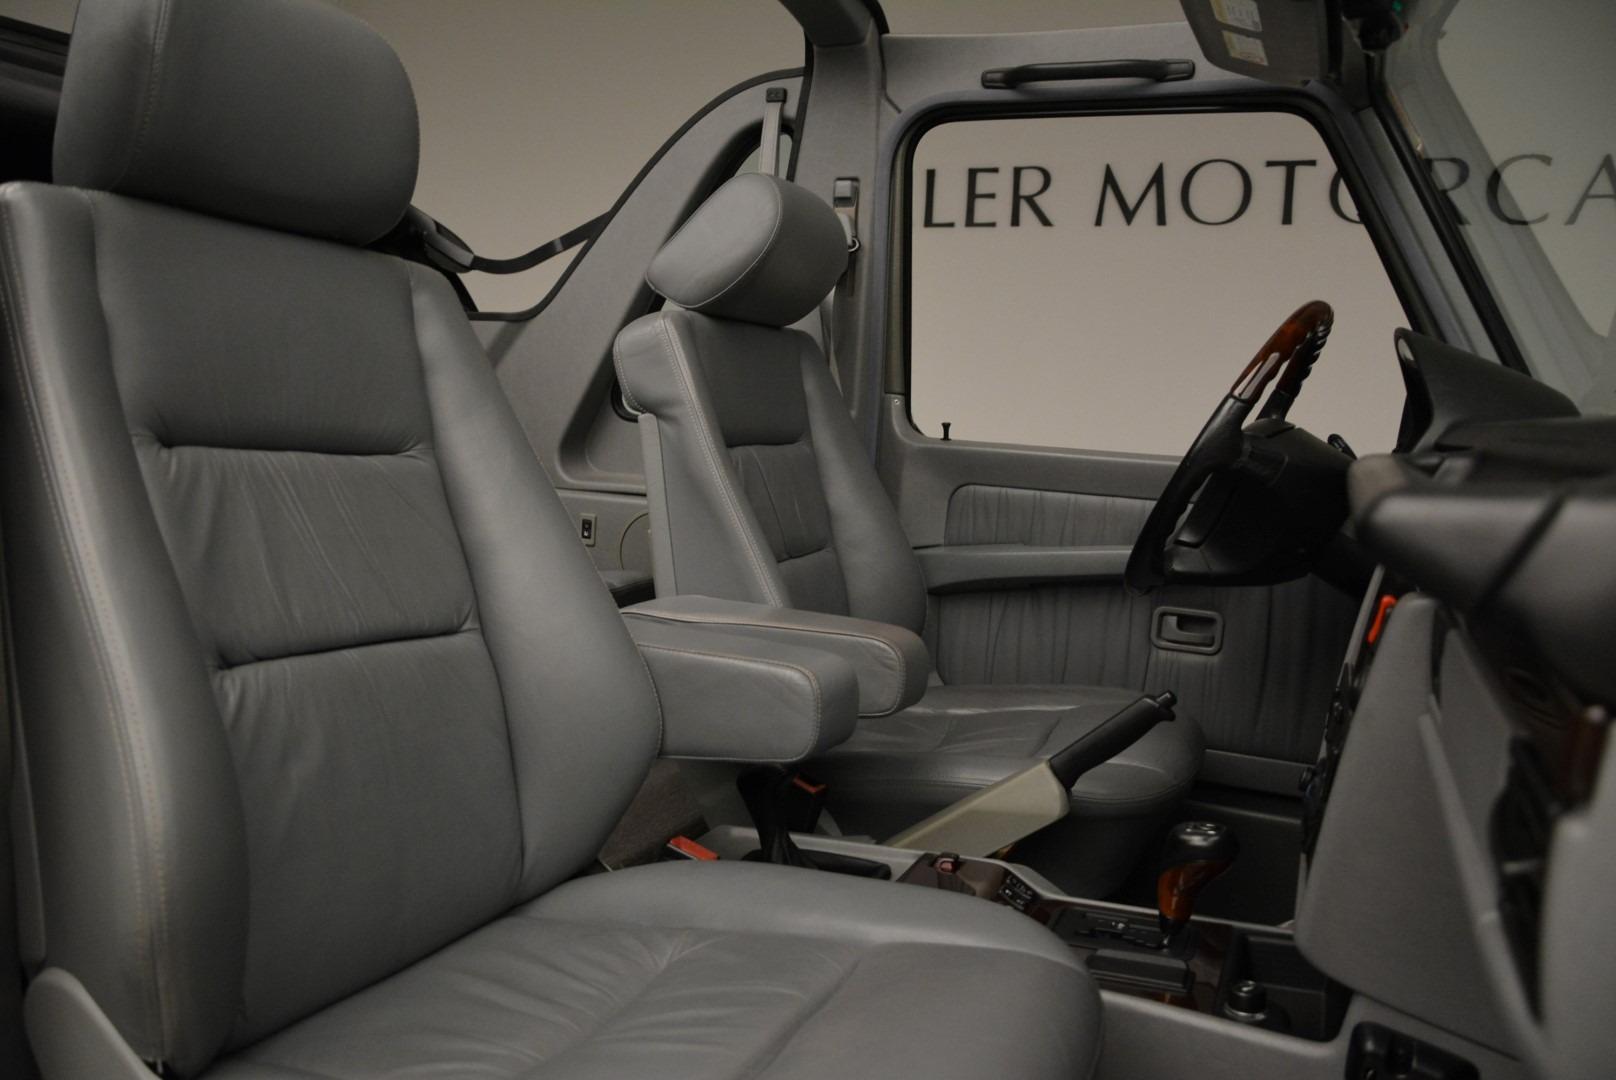 Used 1999 Mercedes Benz G500 Cabriolet